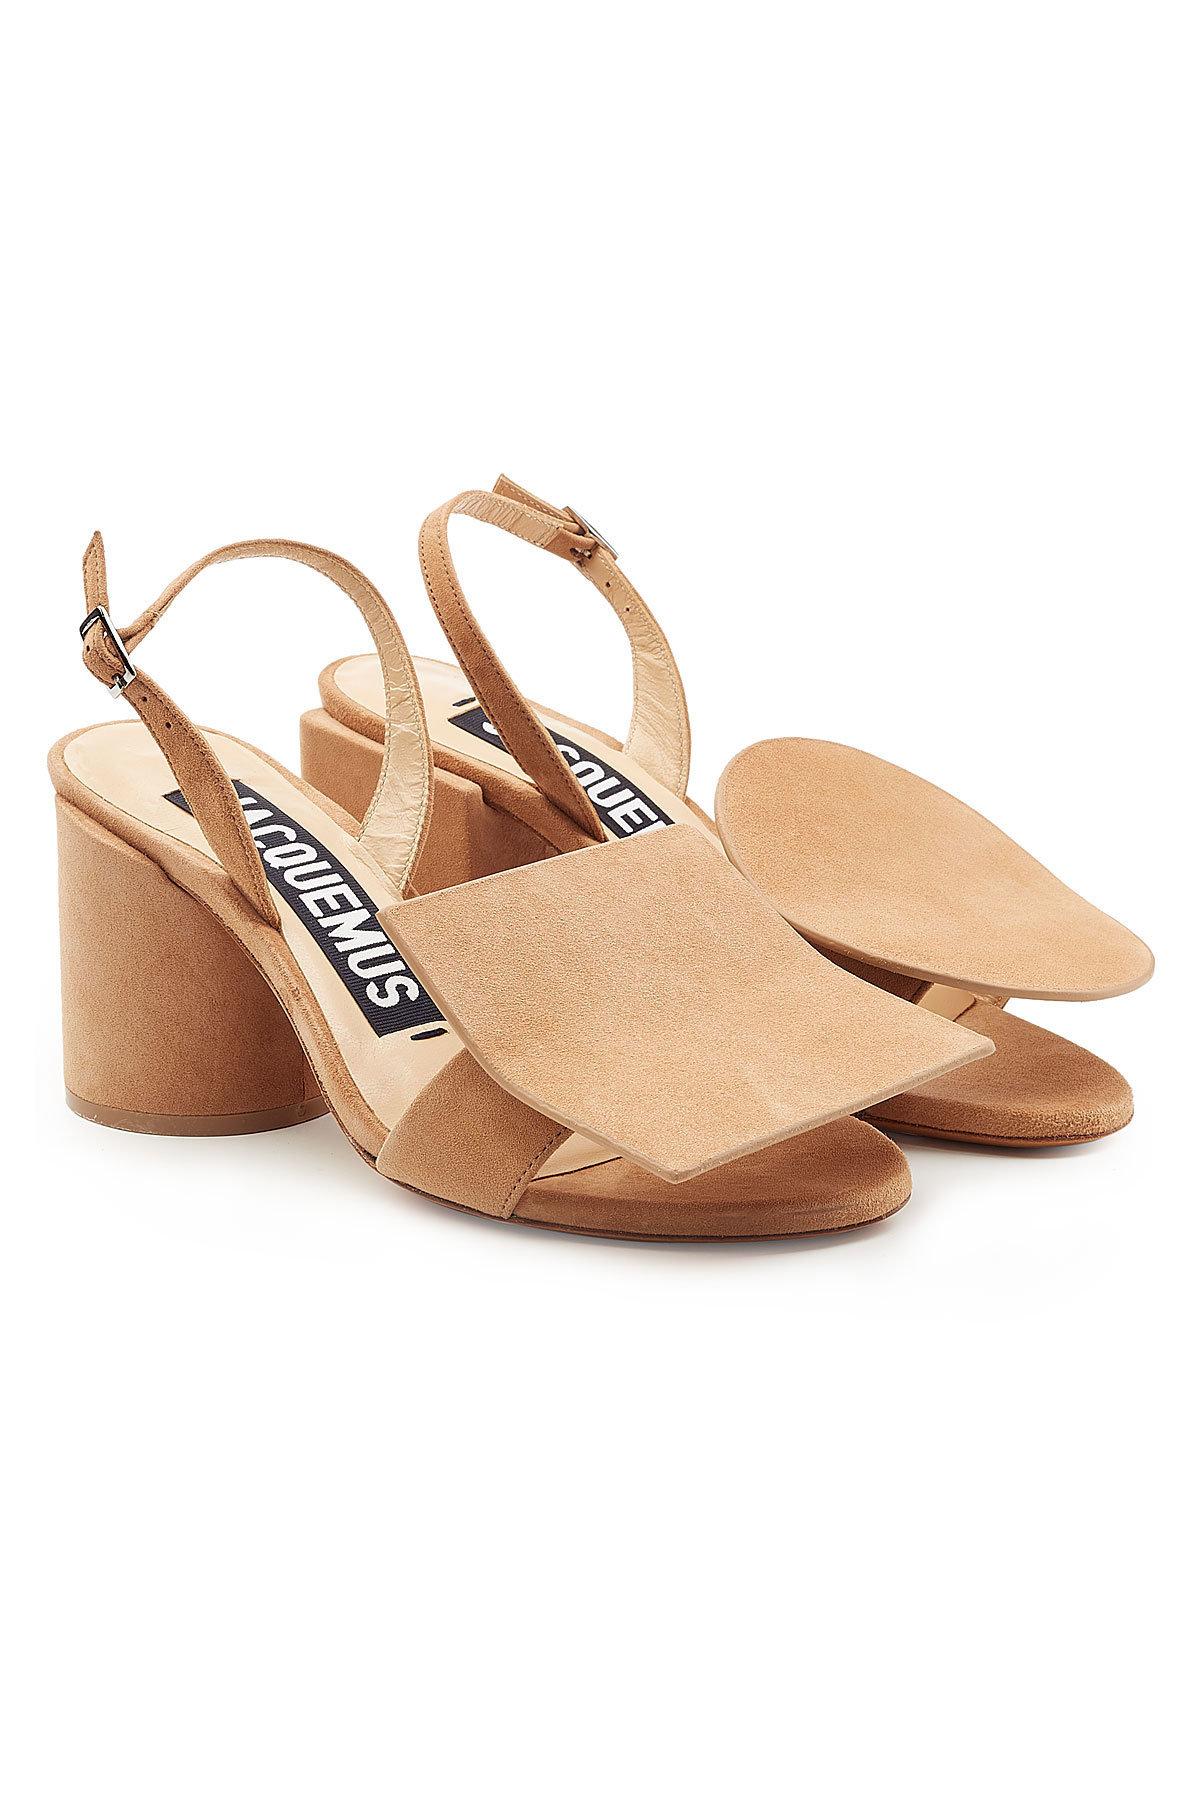 Salvatore Ferragamo Elba Suede Sandals Gr. US 6.5